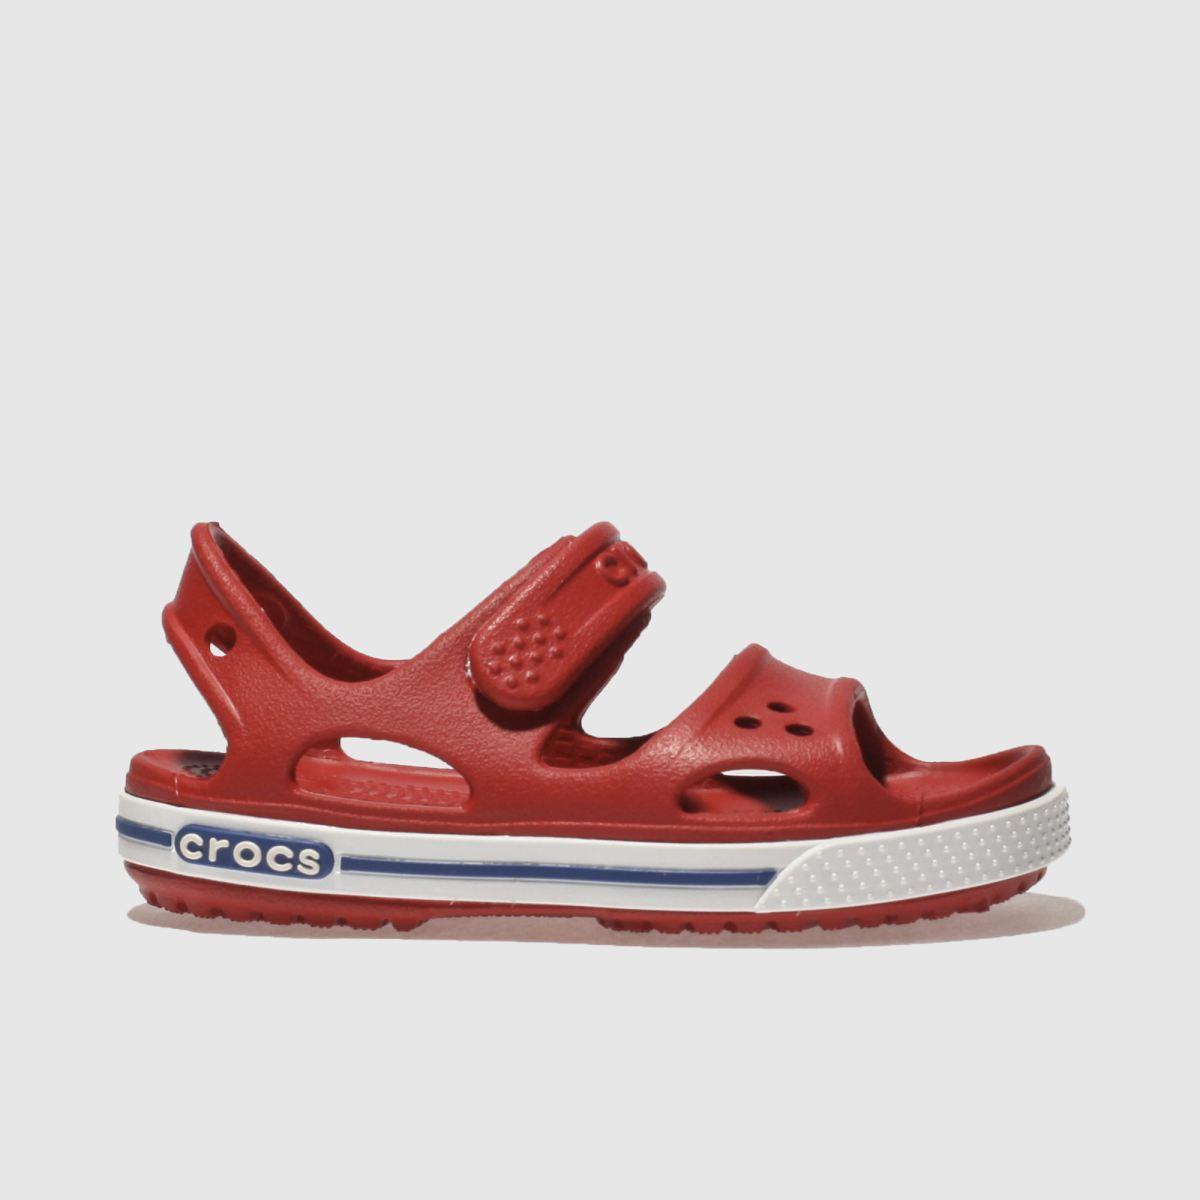 Crocs Red Crocband Ii Sandal Sandals Junior